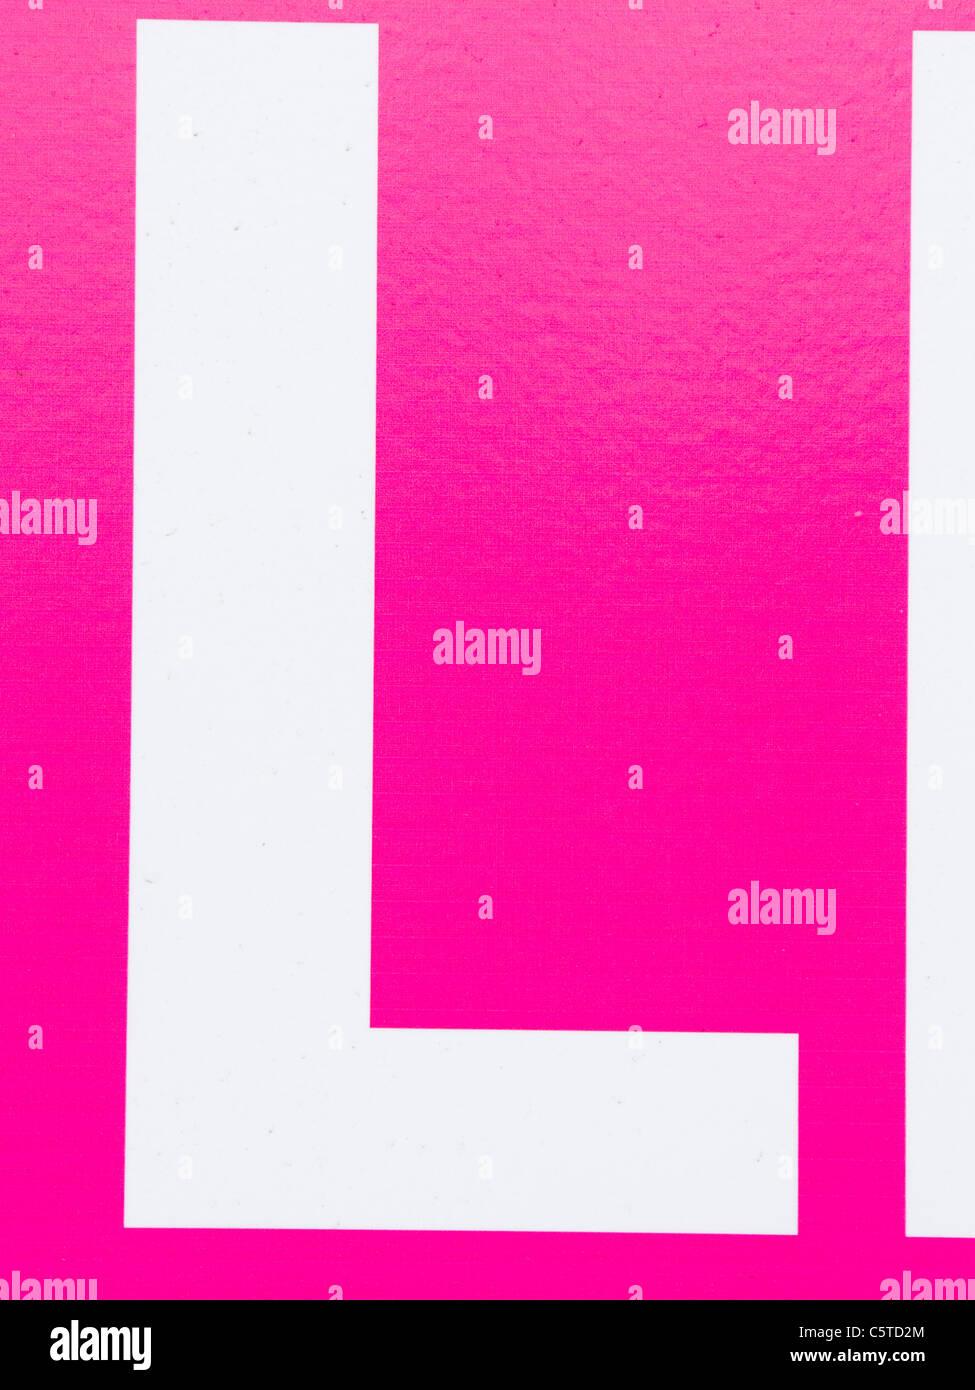 Alphabet L Stock Photos & Alphabet L Stock Images - Alamy